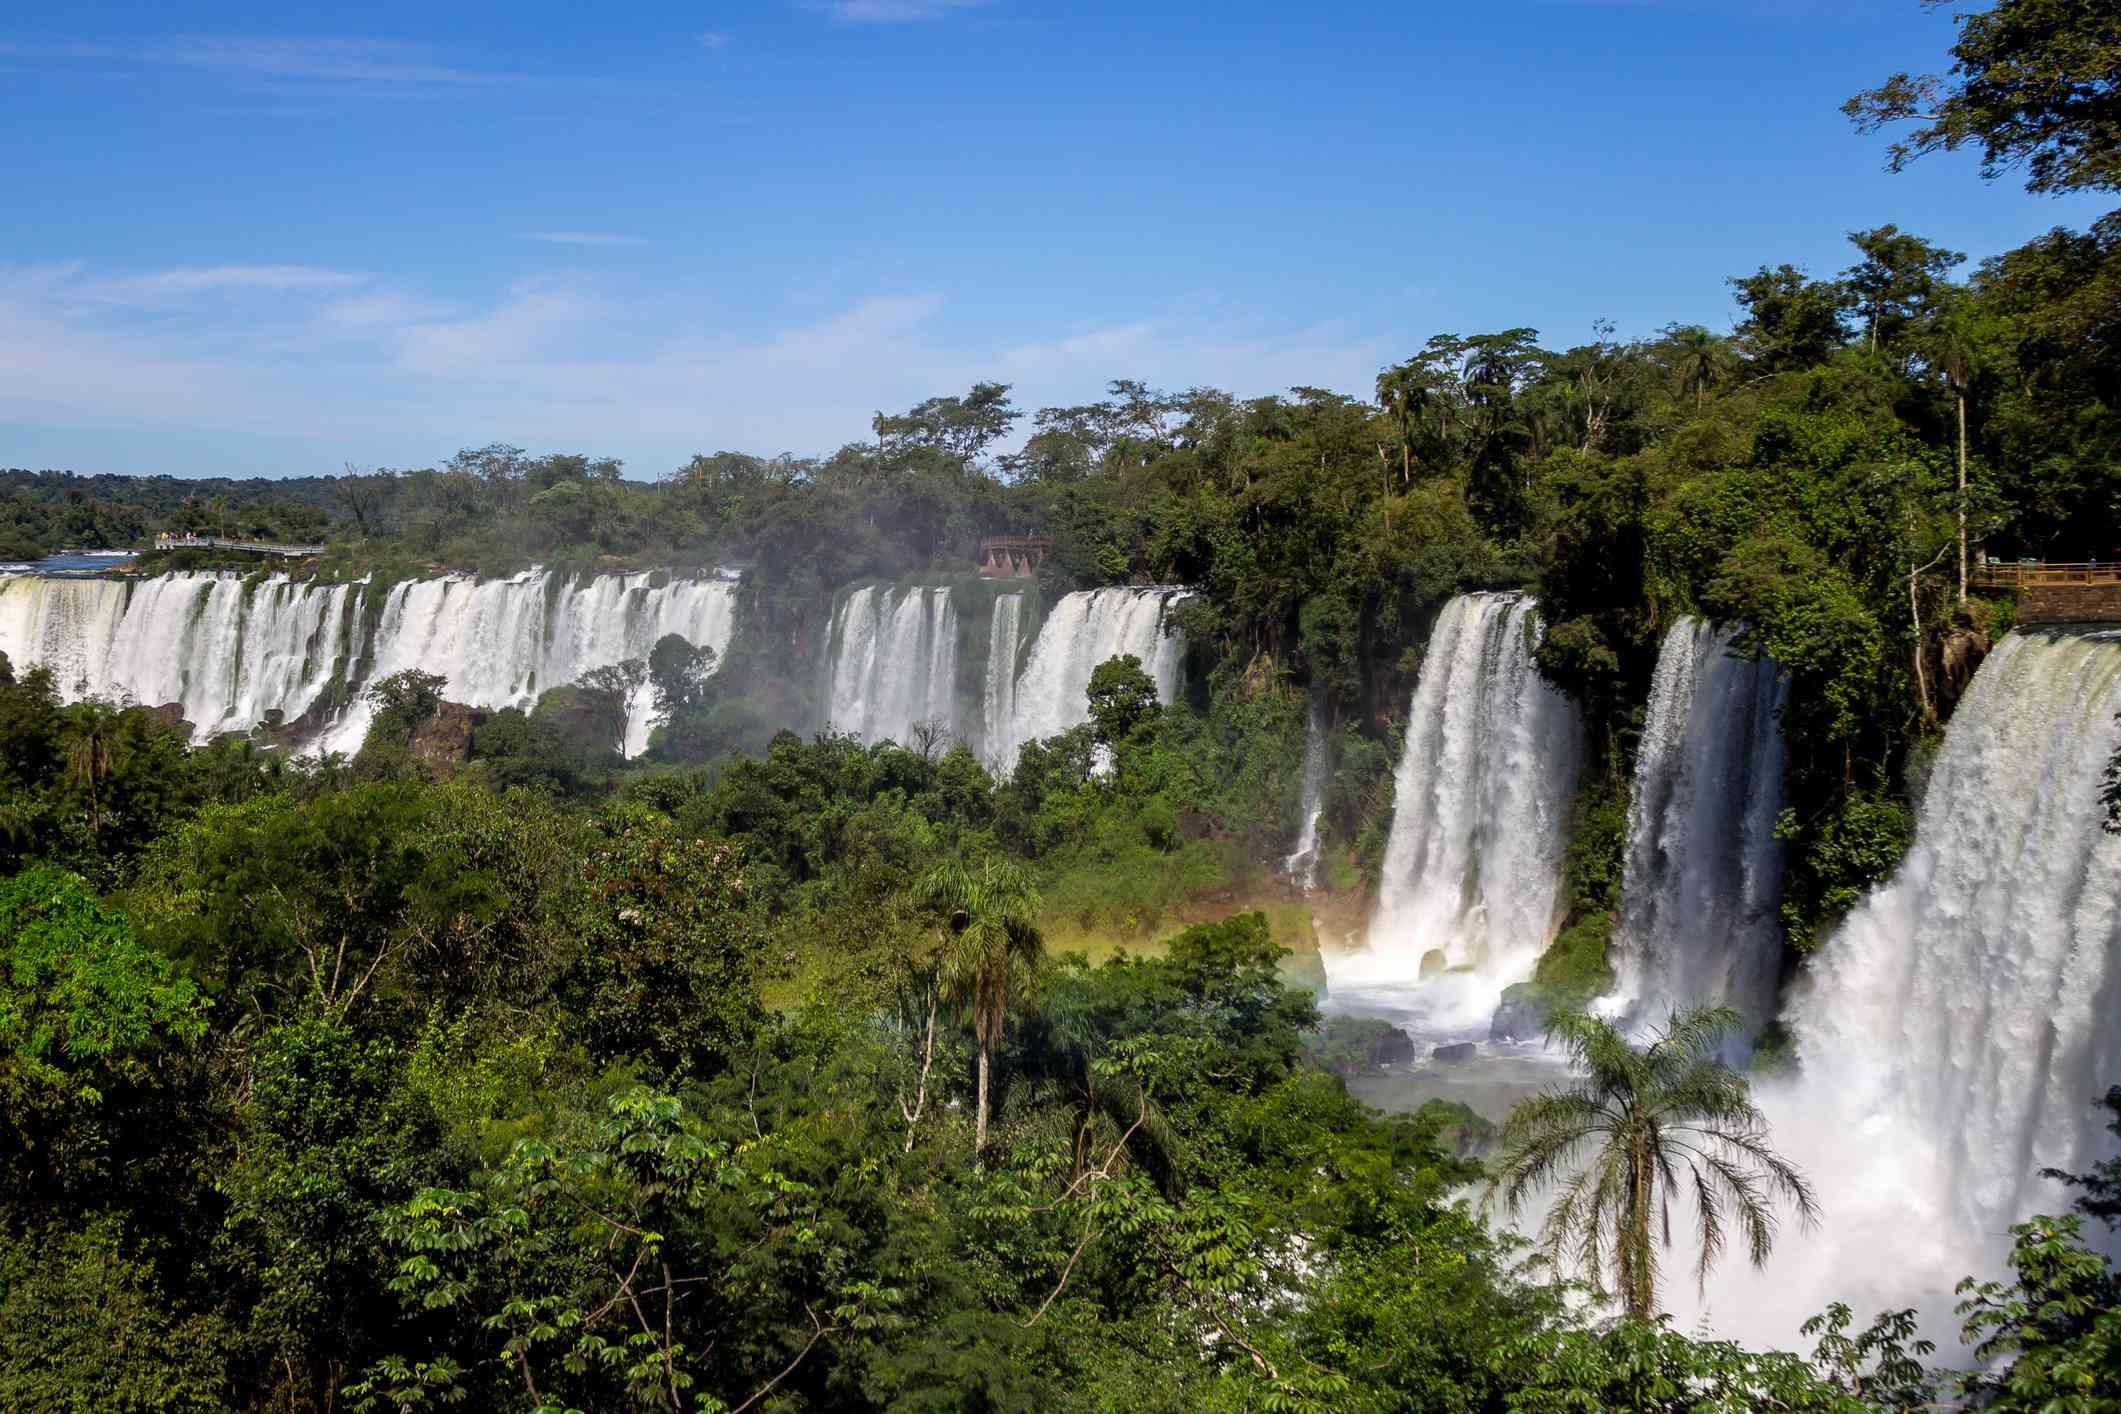 Iguazua Falls hike